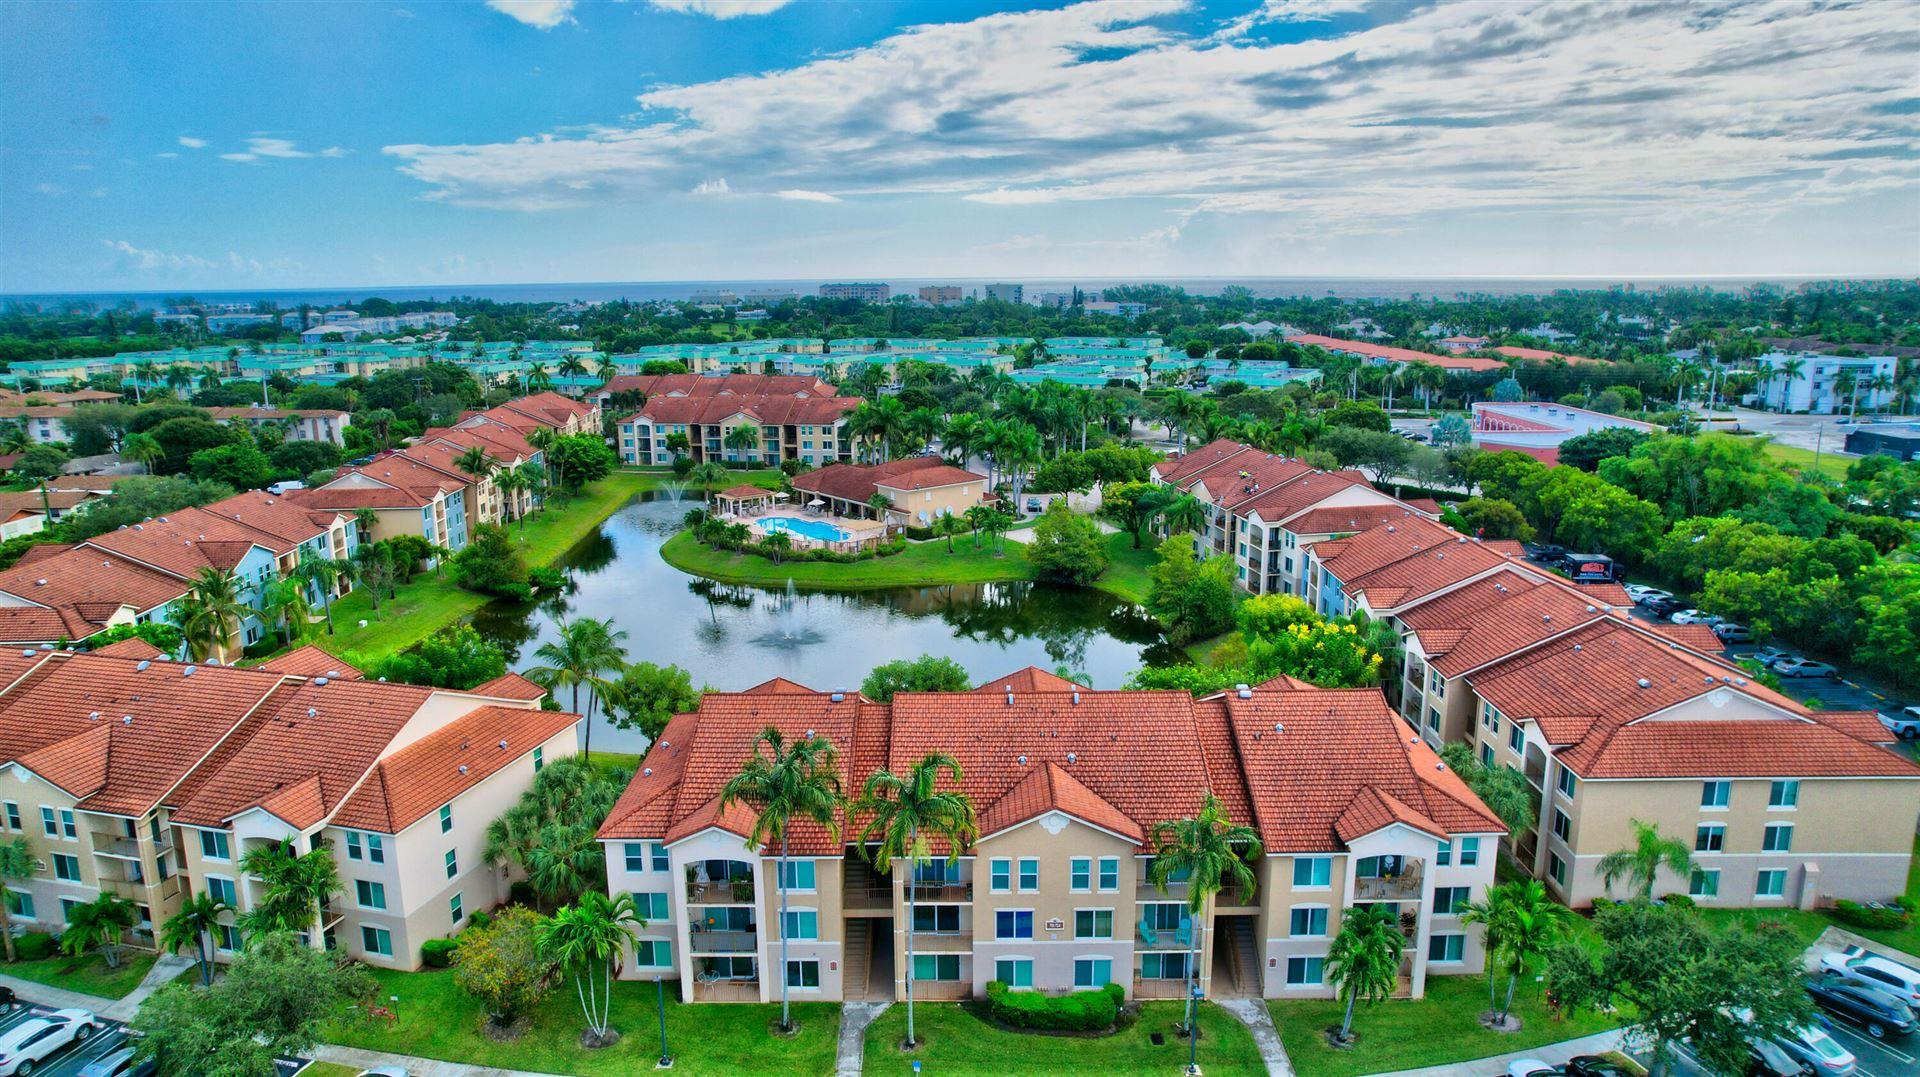 Photo for 712 Villa Circle, Boynton Beach, FL 33435 (MLS # RX-10751996)